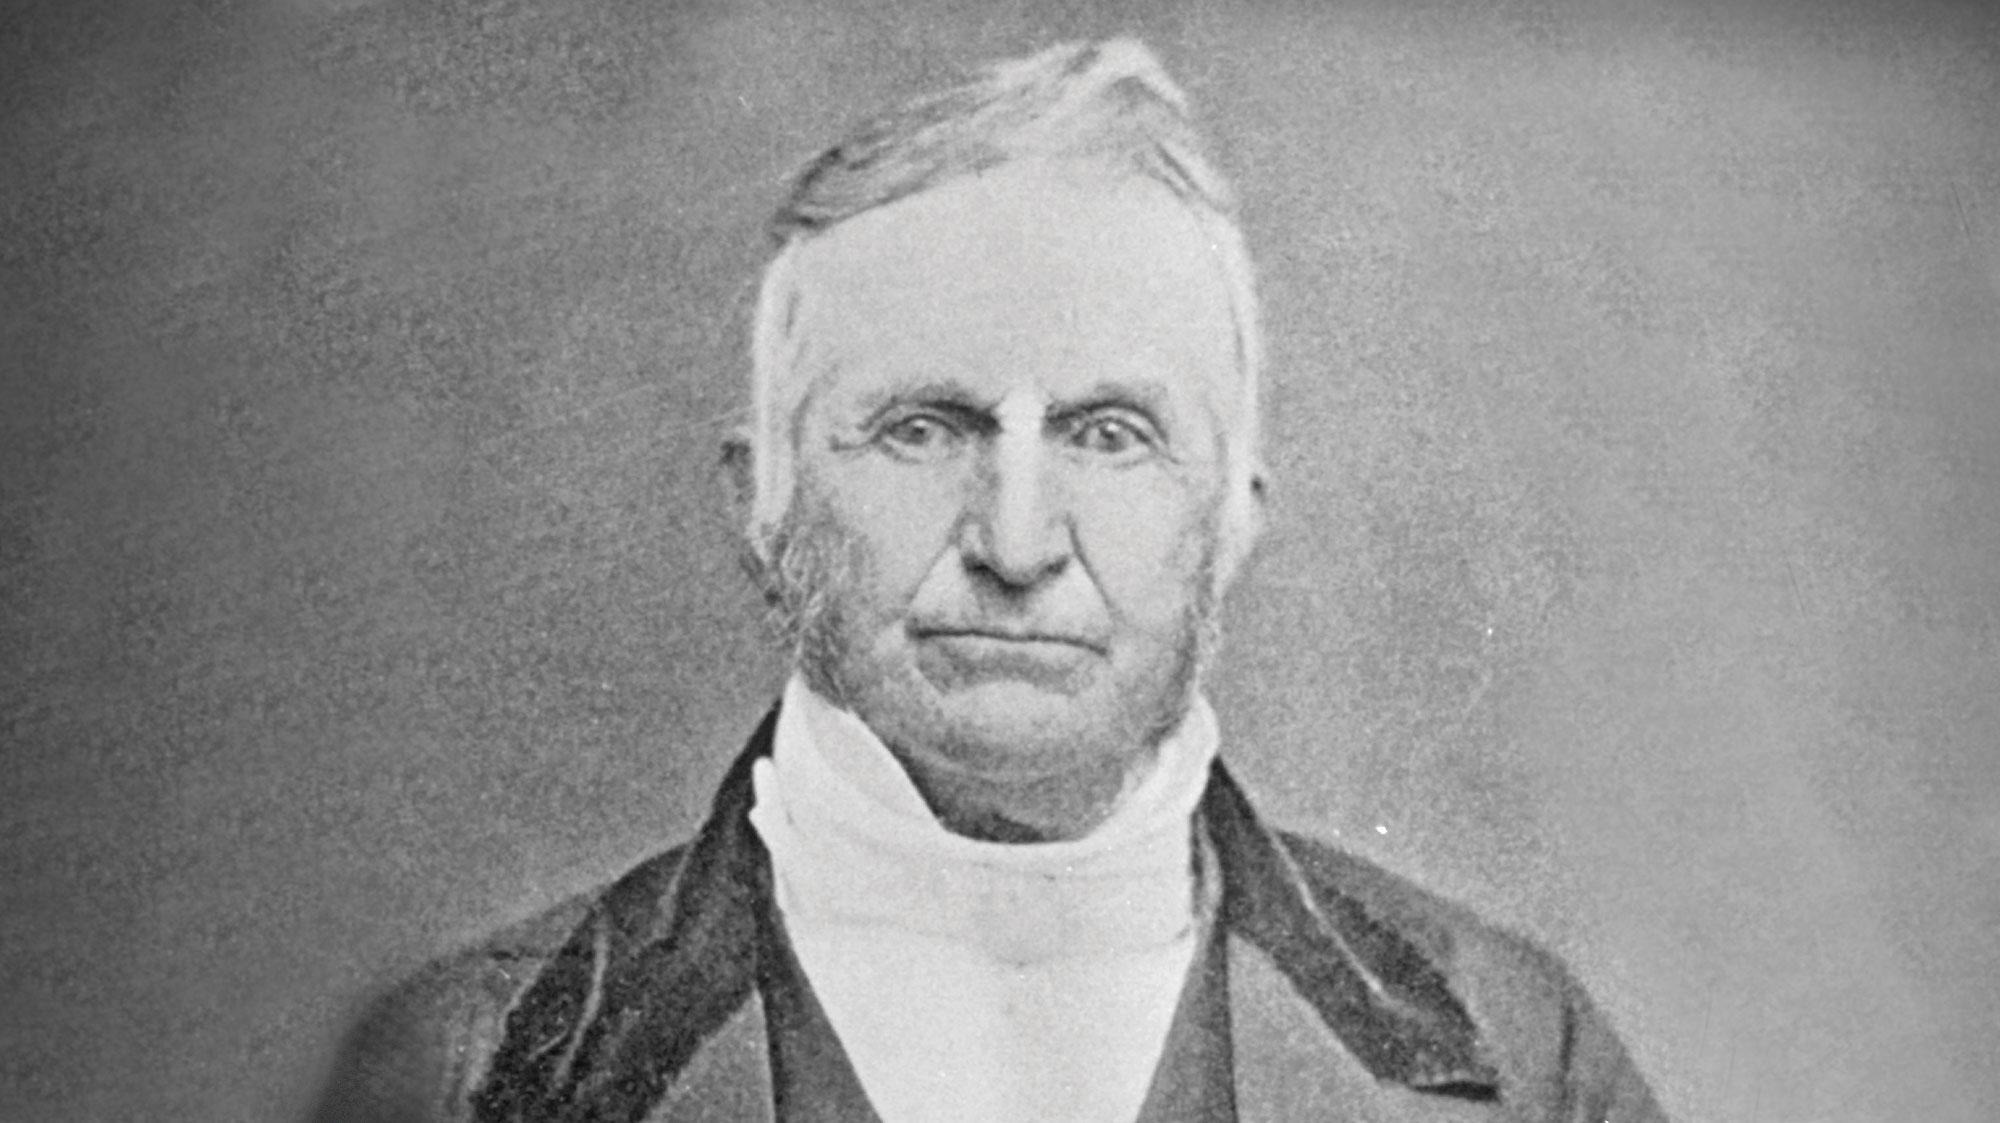 Toppan Robbie in 1868